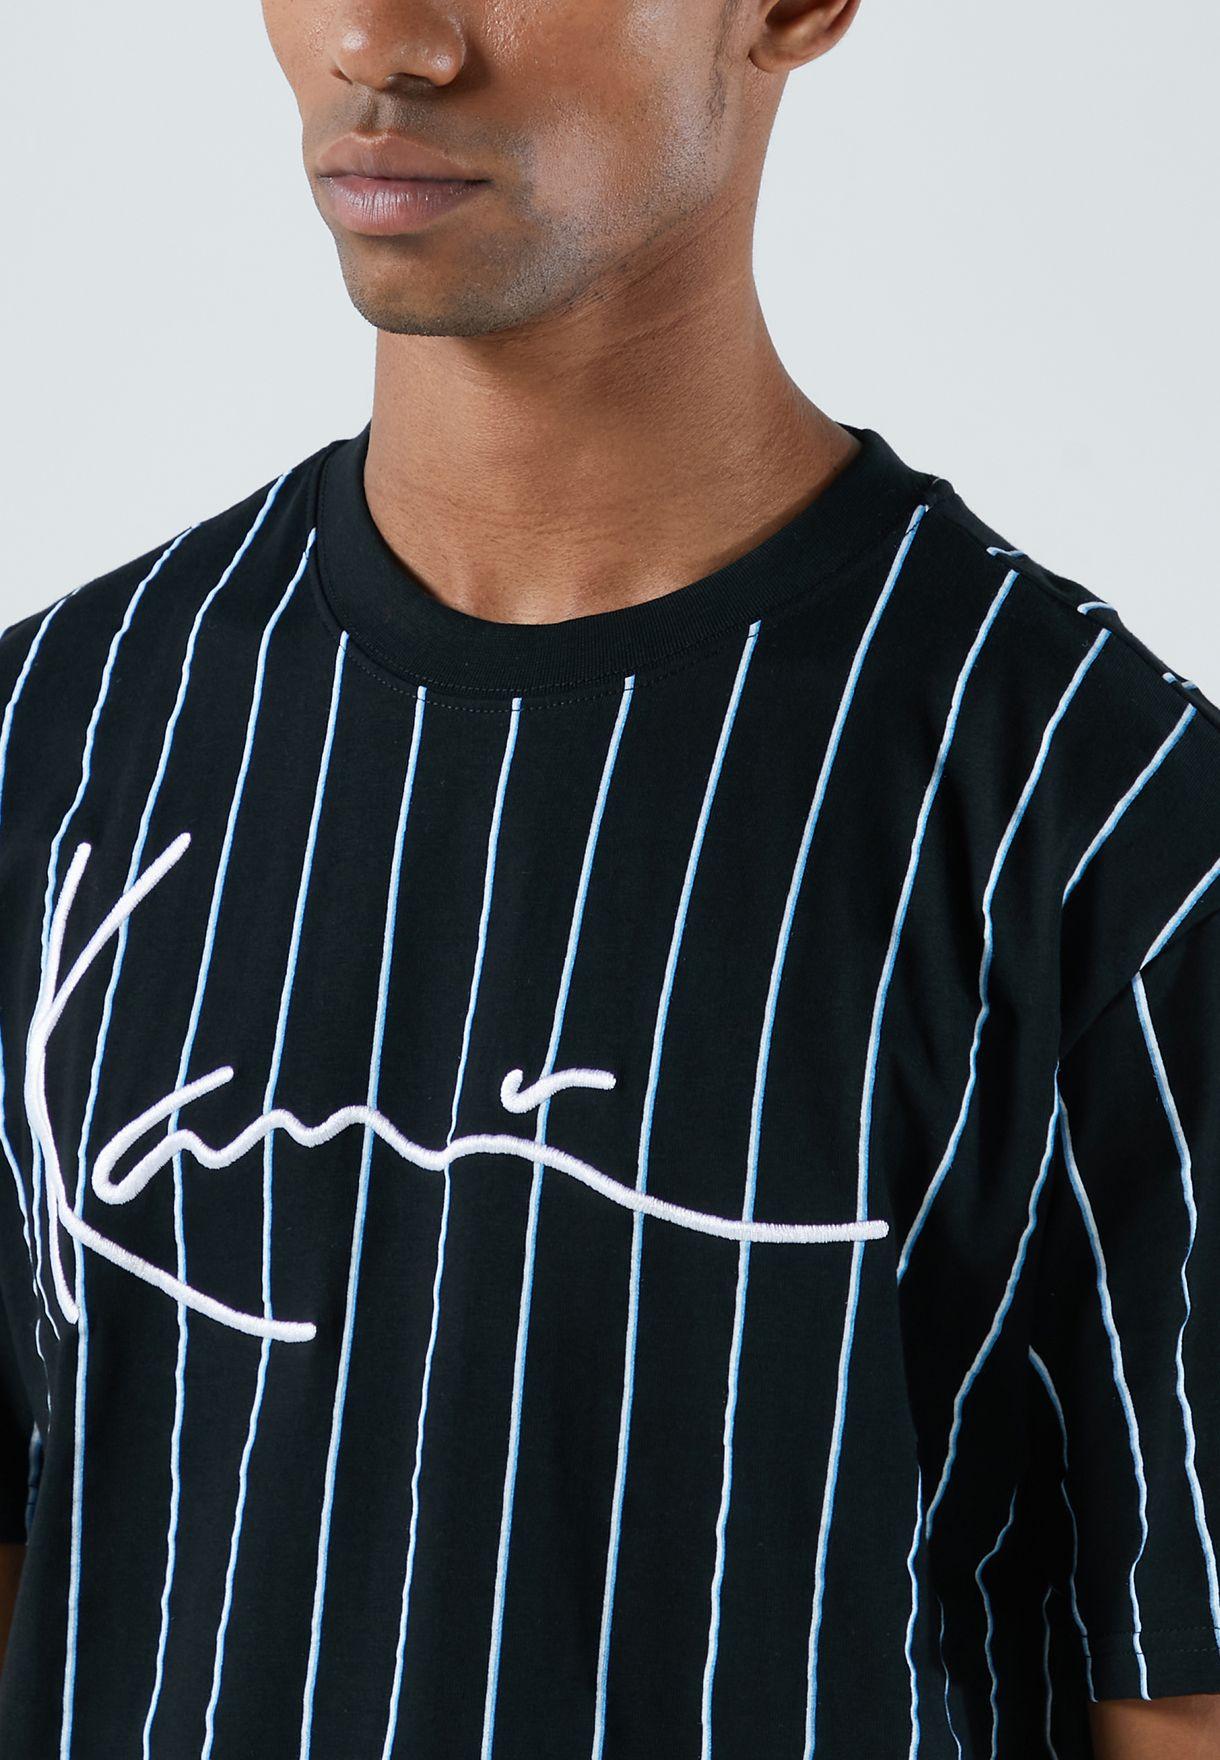 Signature Pinstripe T-Shirt